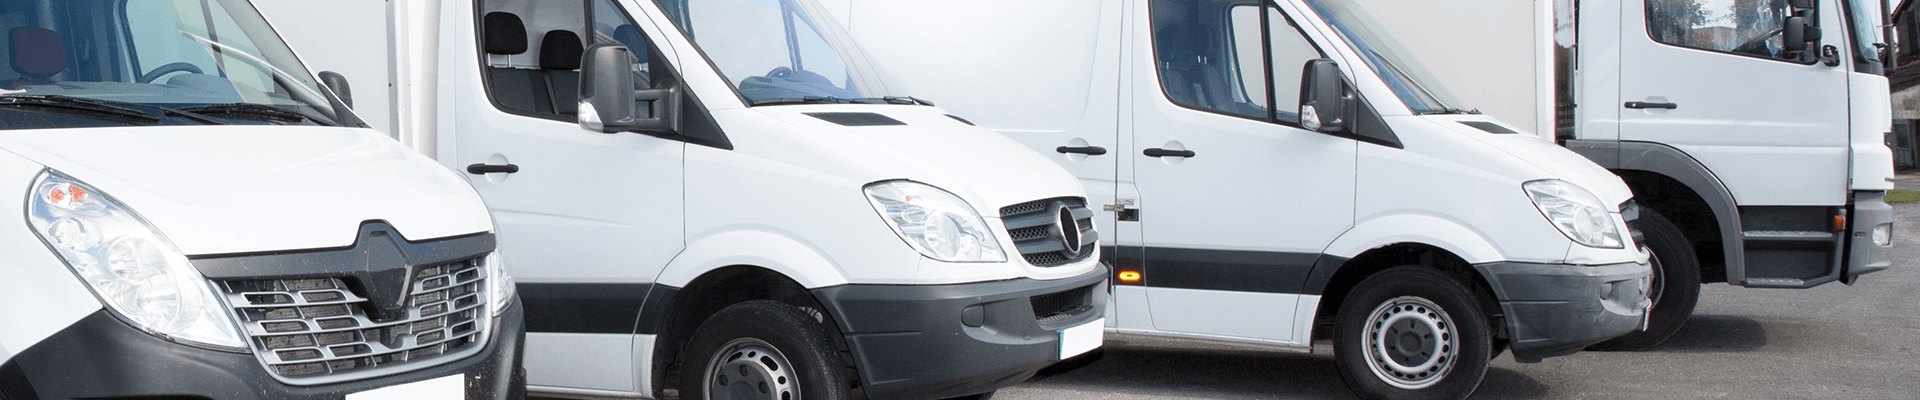 banner-empresa-exitosa-transporte